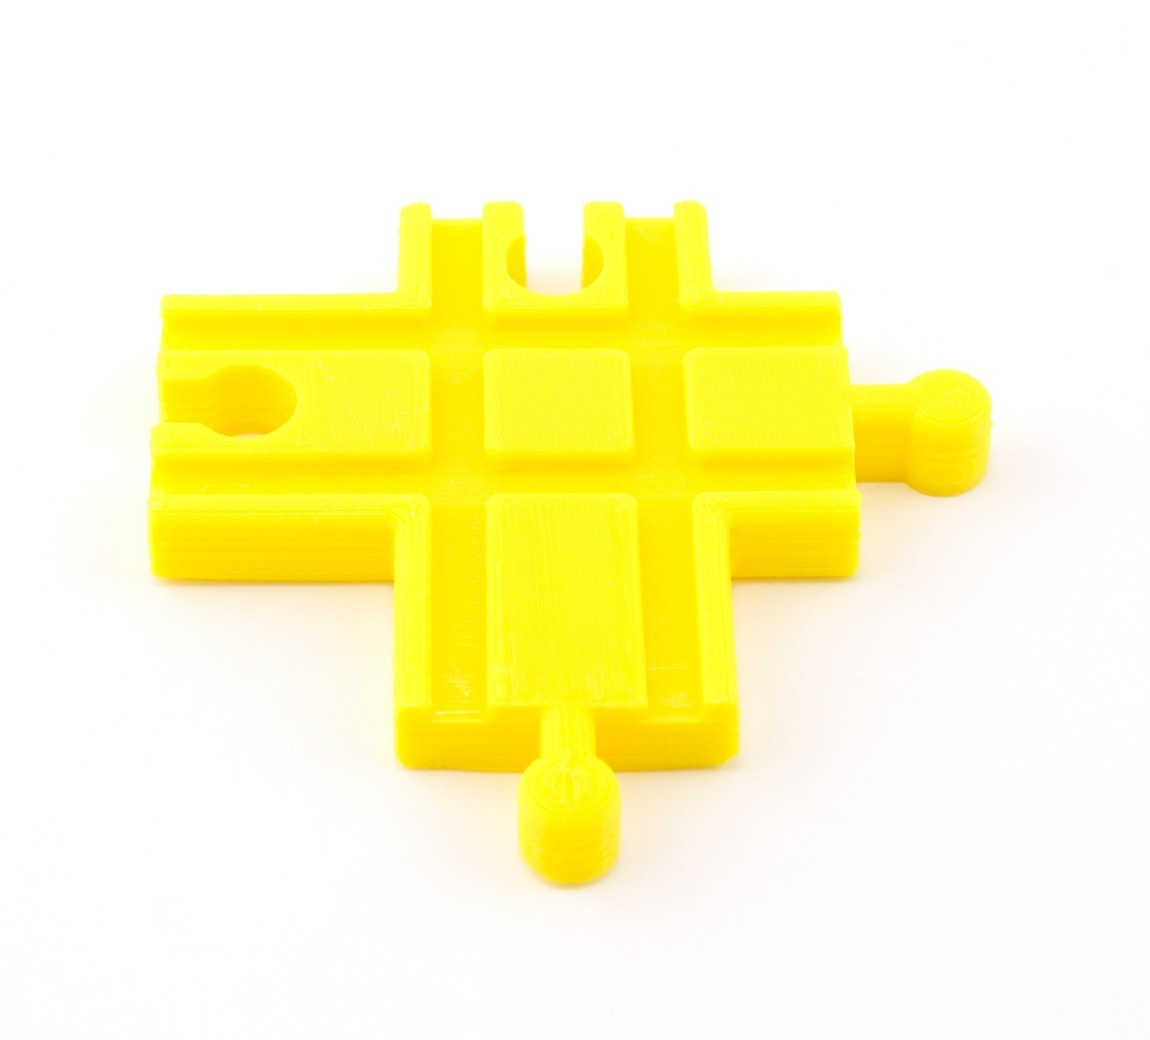 91cb4f62ceb4627f4039d91b0e40adb8_1449686691271_12.2.15-product-shoot-136.jpg Download free STL file Toy Train Tracks • 3D printer design, FerryTeacher